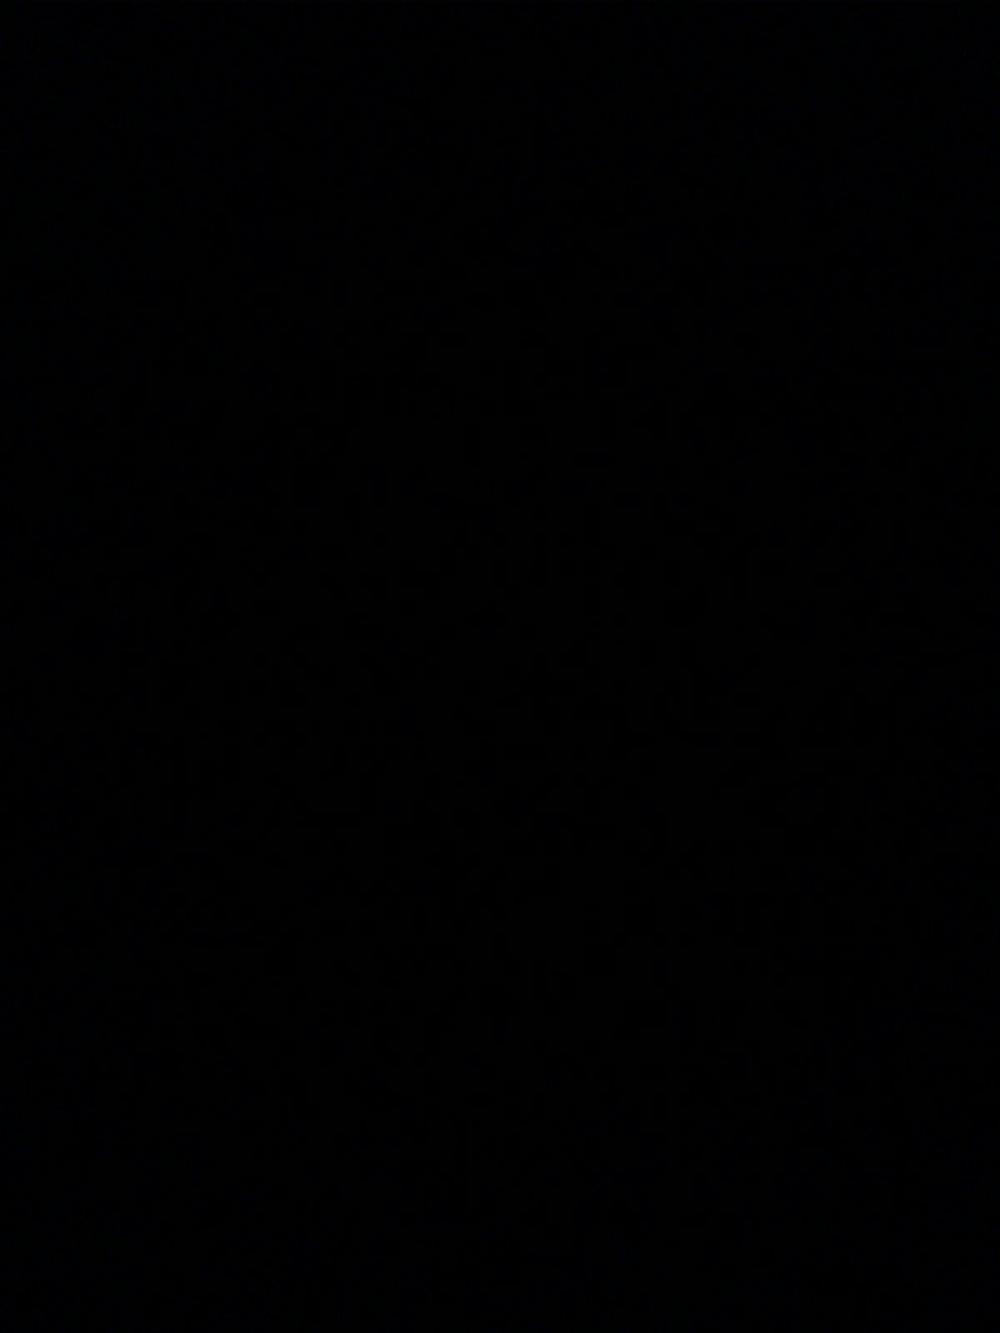 Black_photo.jpg